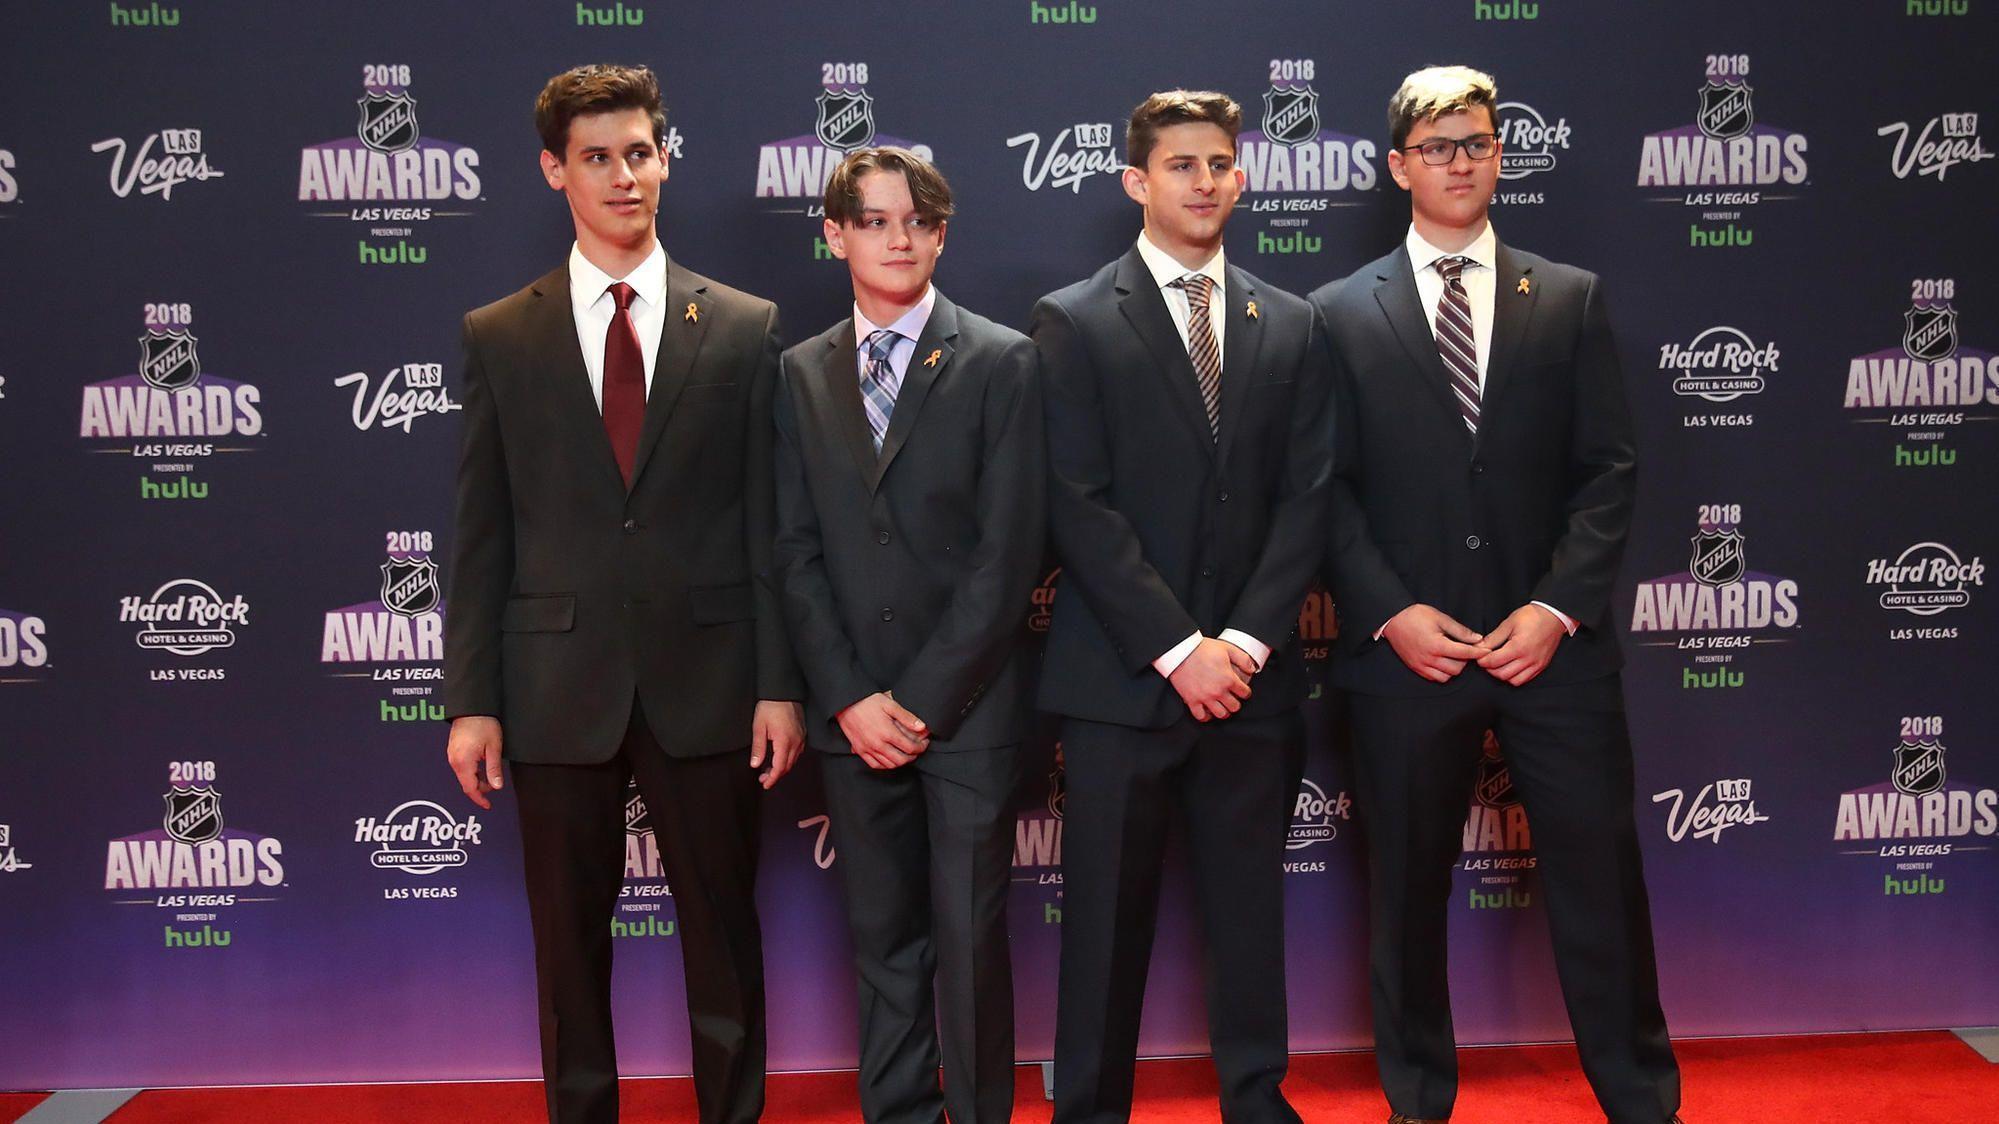 Fl-sp-panthers-nhl-awards-20180620